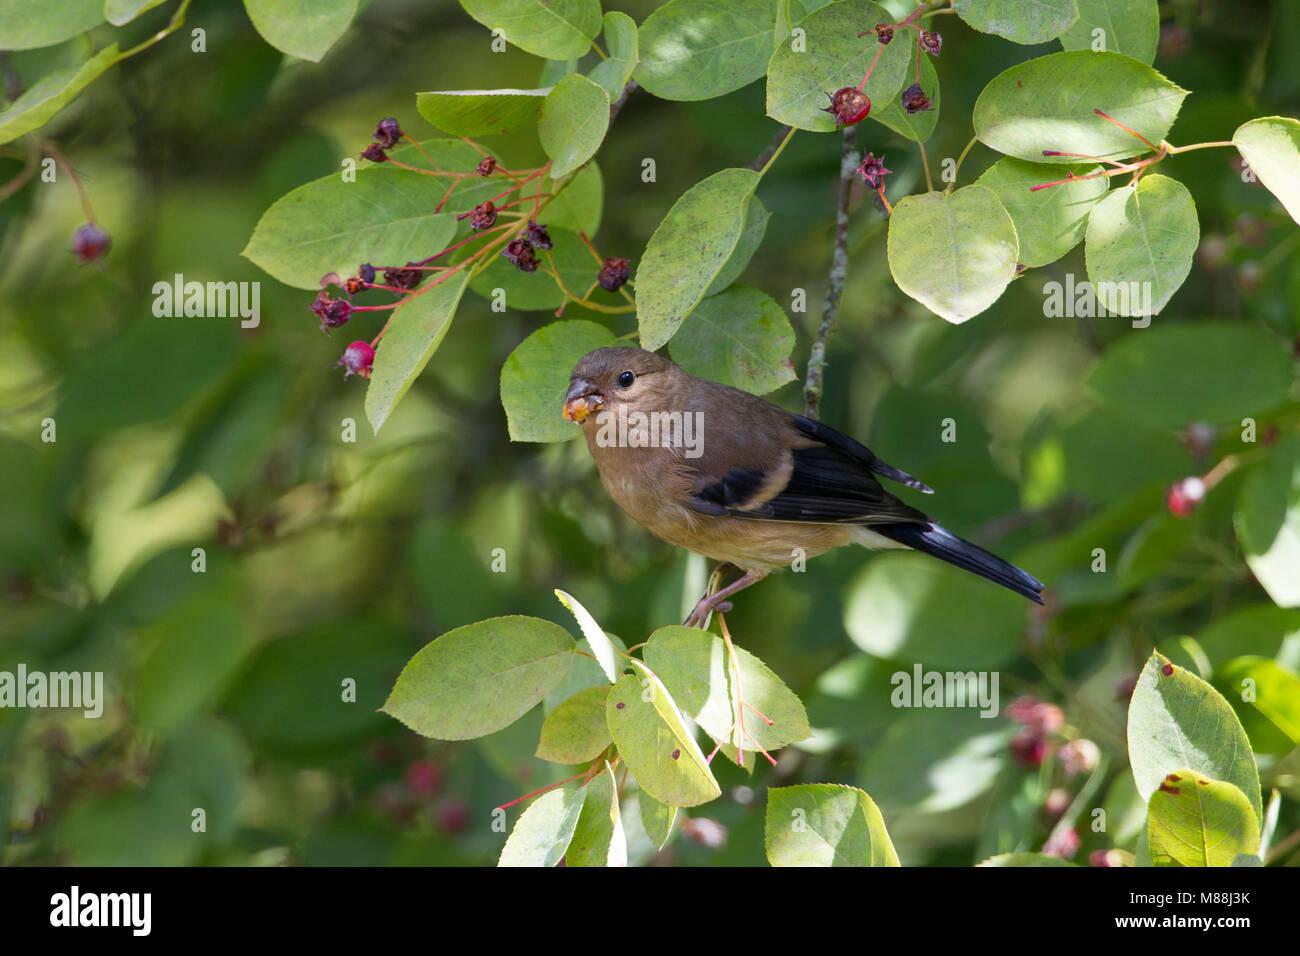 Bullfinch, Pyrrhula pyrrhula, single juvenile feeding on fruits of Amelanchier canadensis. Worcestershire, UK. - Stock Image